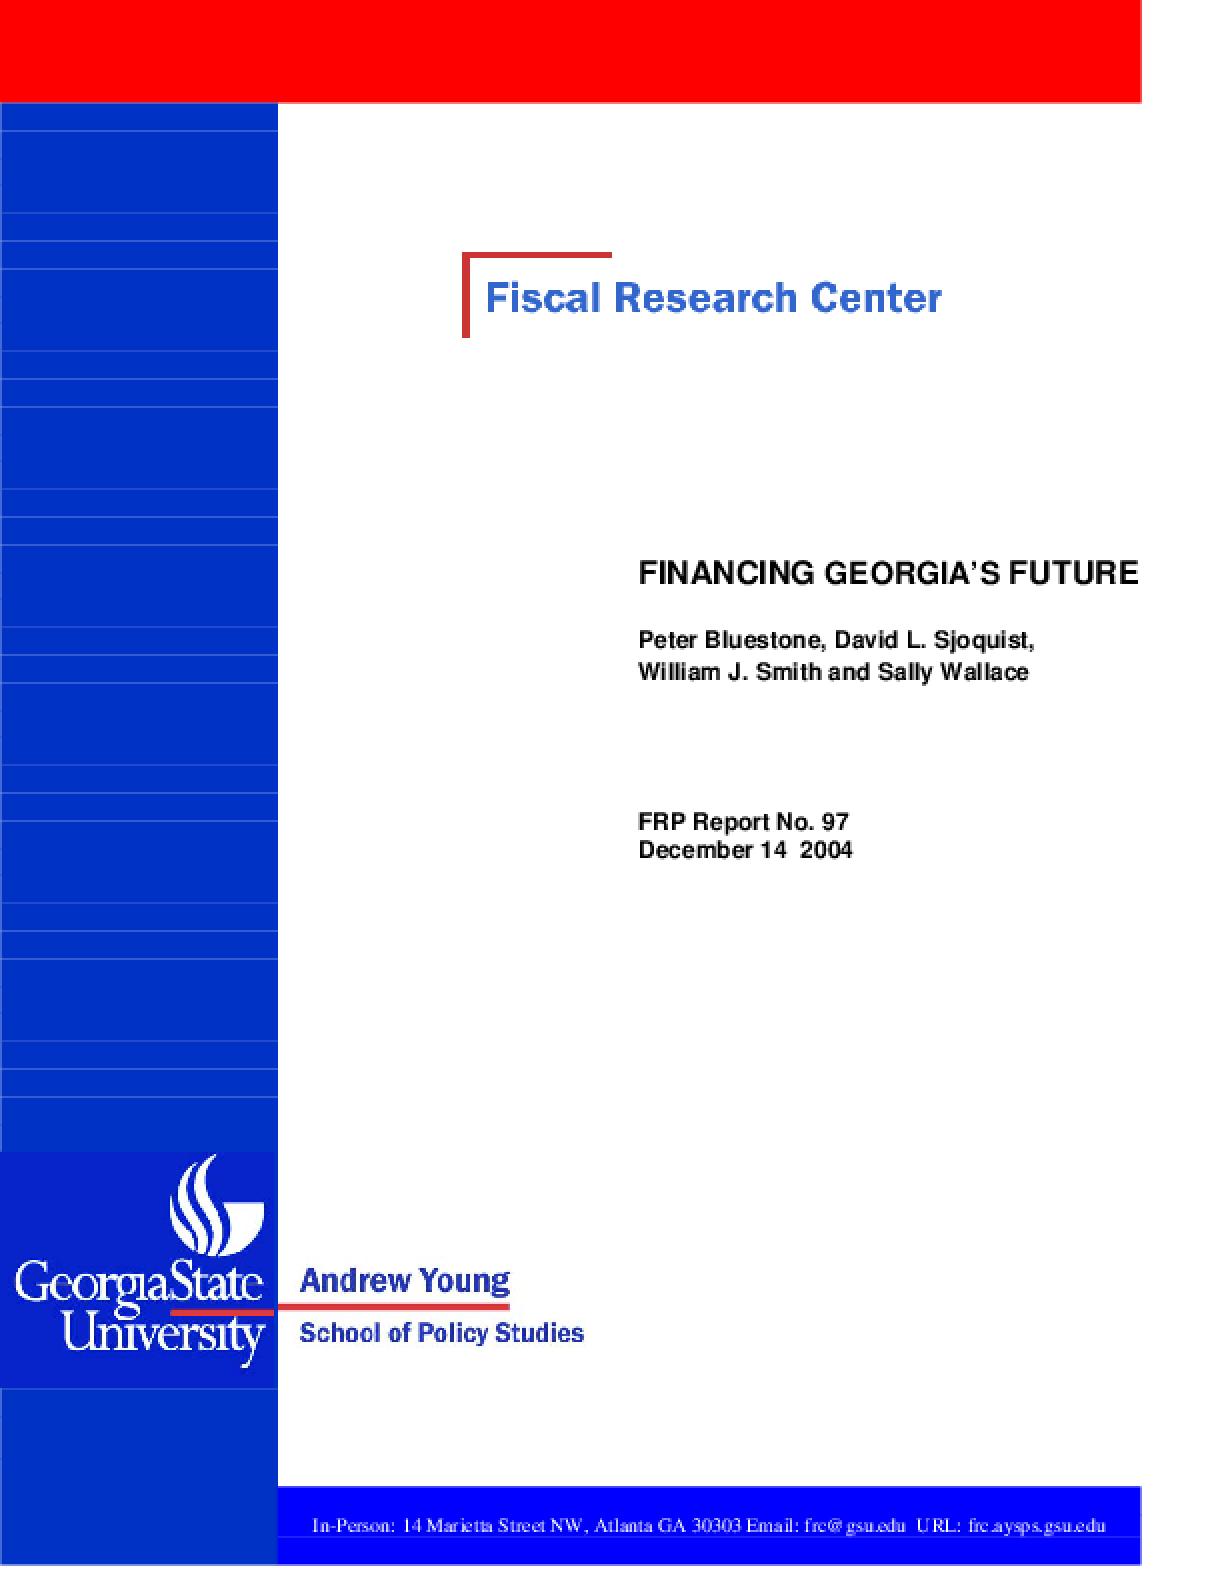 Financing Georgia's Future